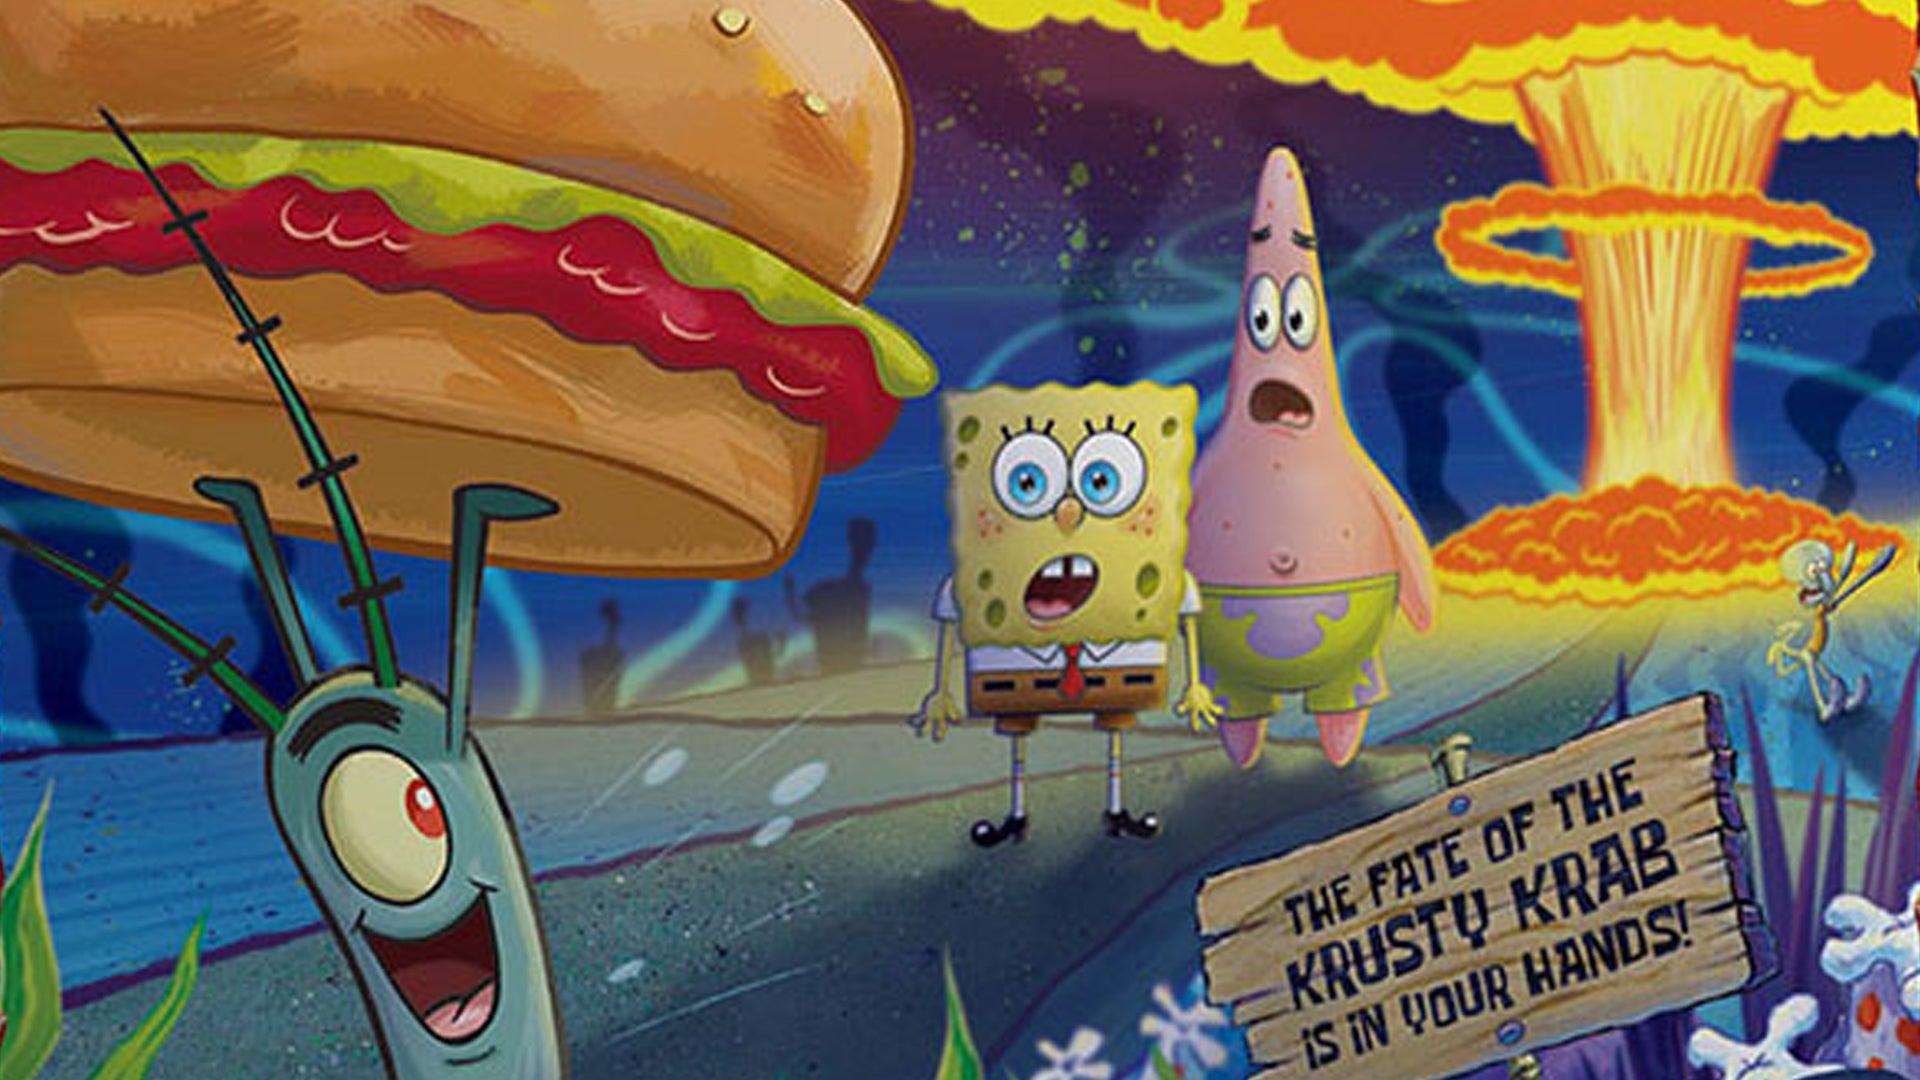 spongebob-plankton-rising-board-game-box-art.jpg